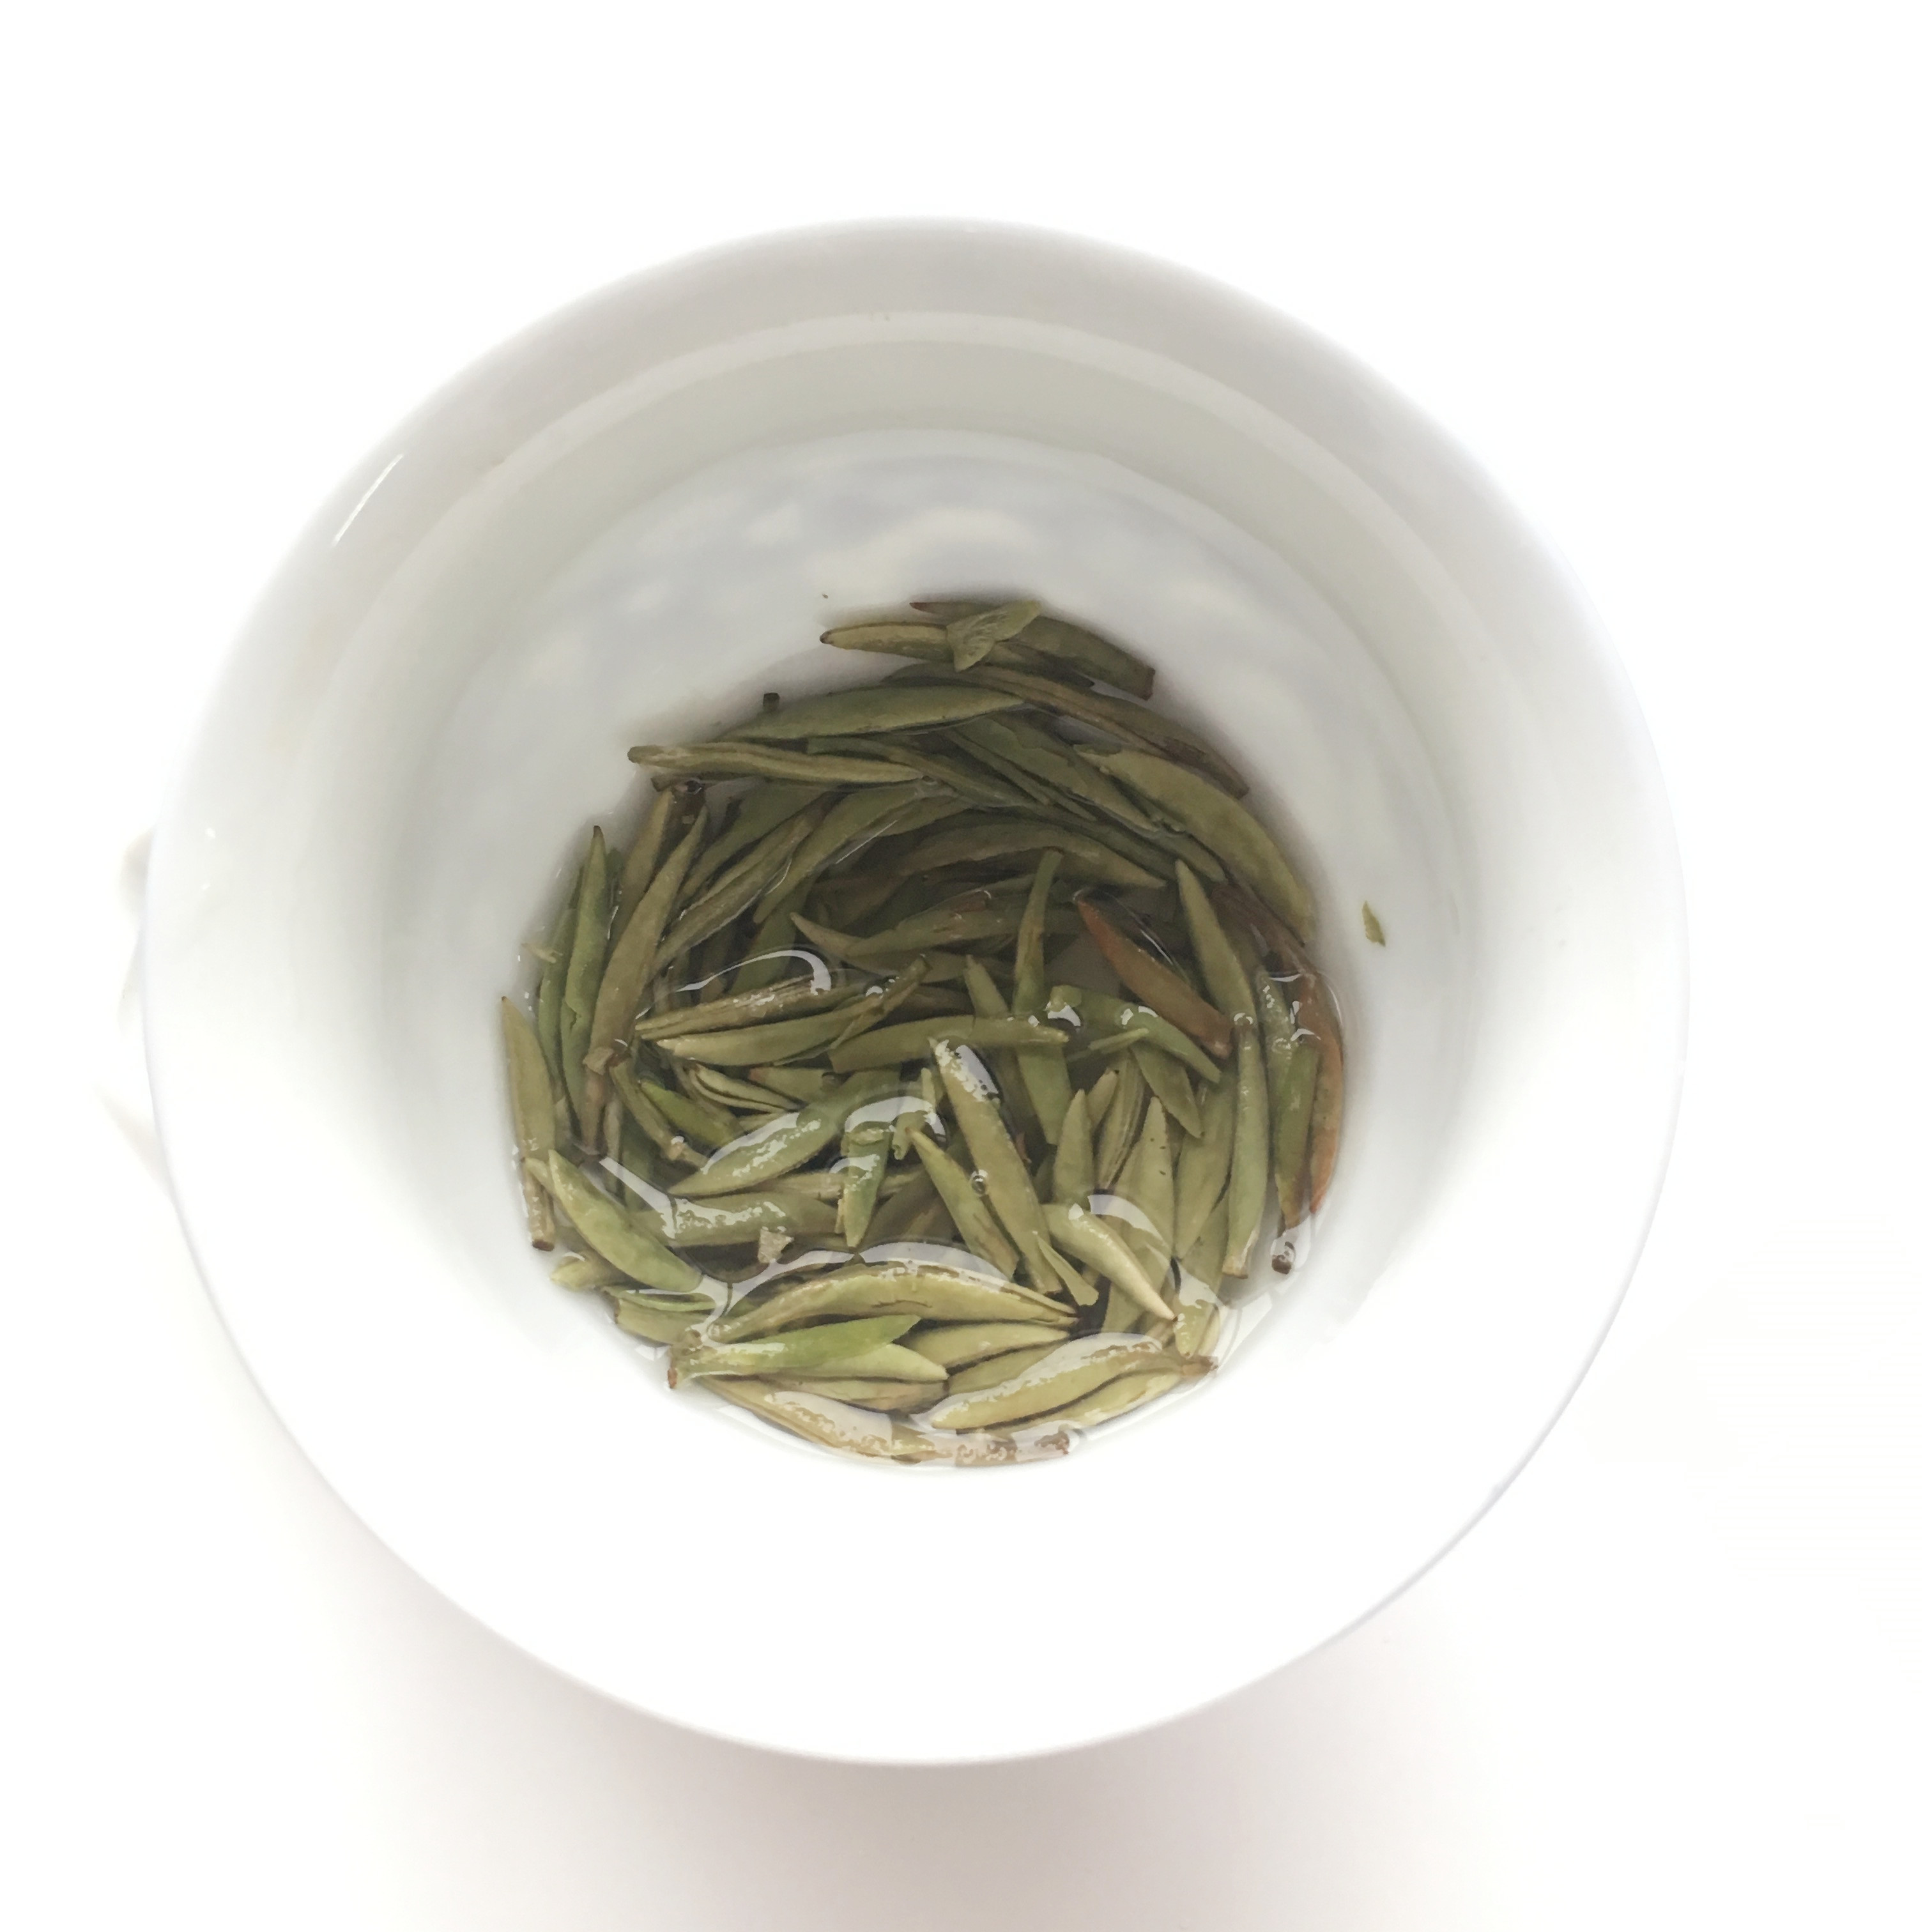 Selected Chinese tea gift organic white tea Sliver Needles bai hao yinzhen - 4uTea | 4uTea.com